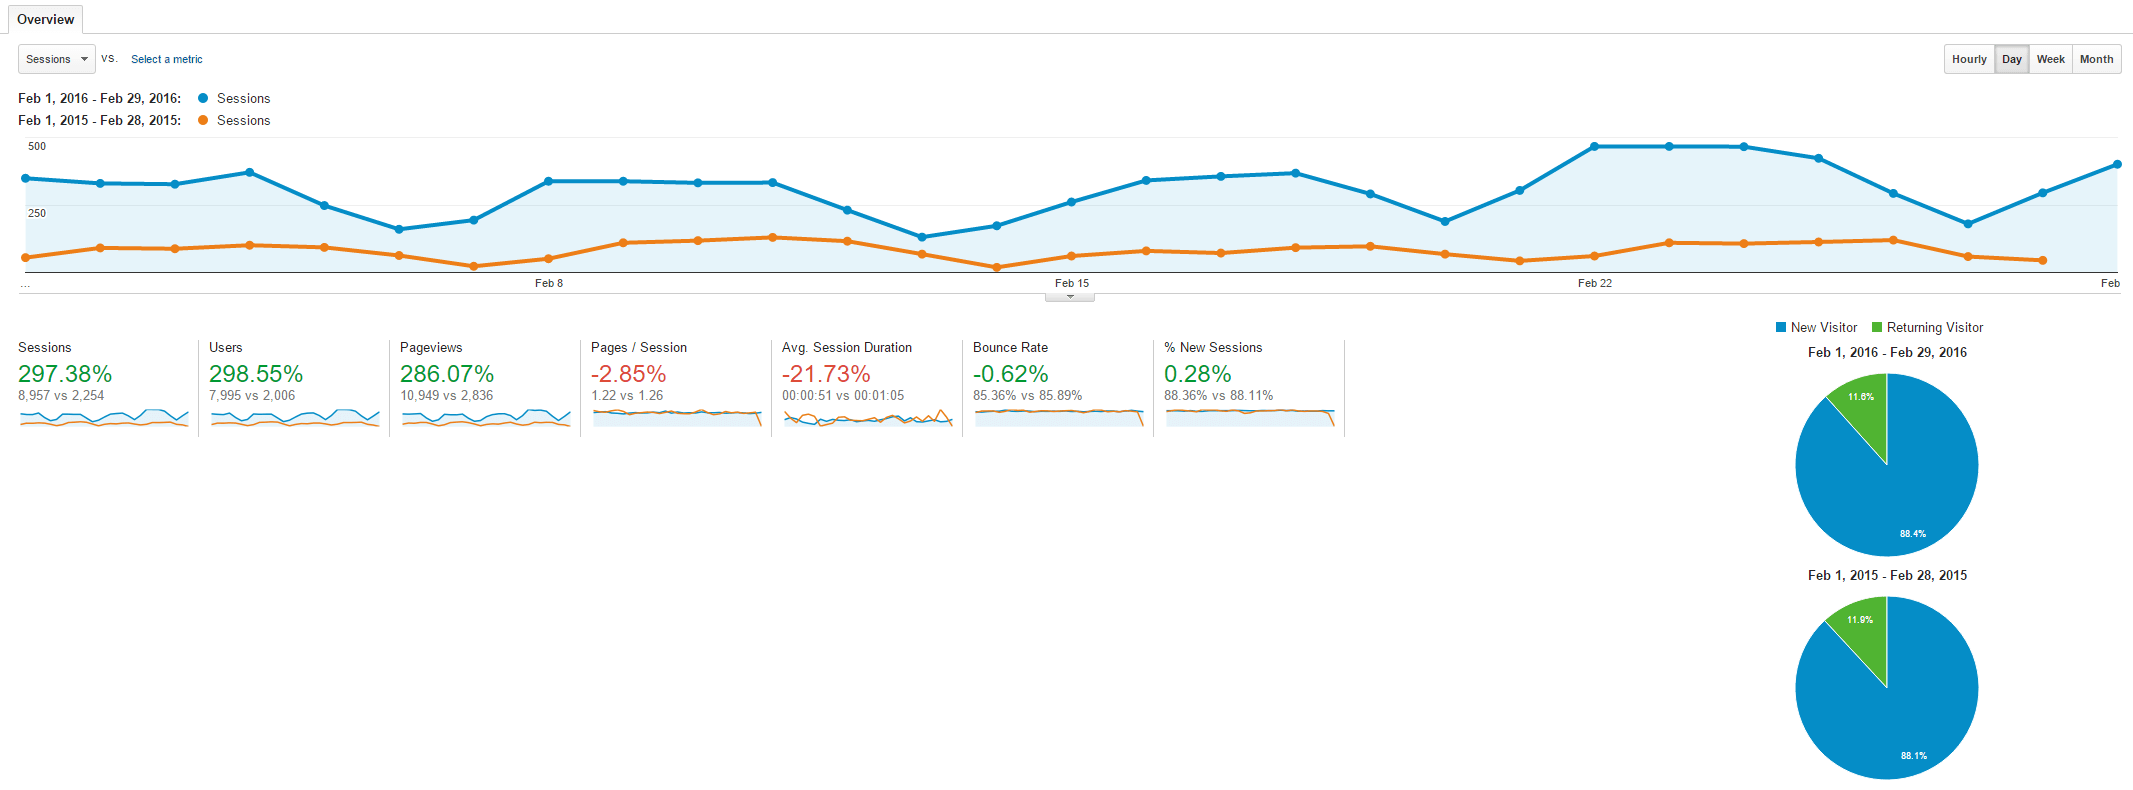 February 2016 vs 2015 Traffic